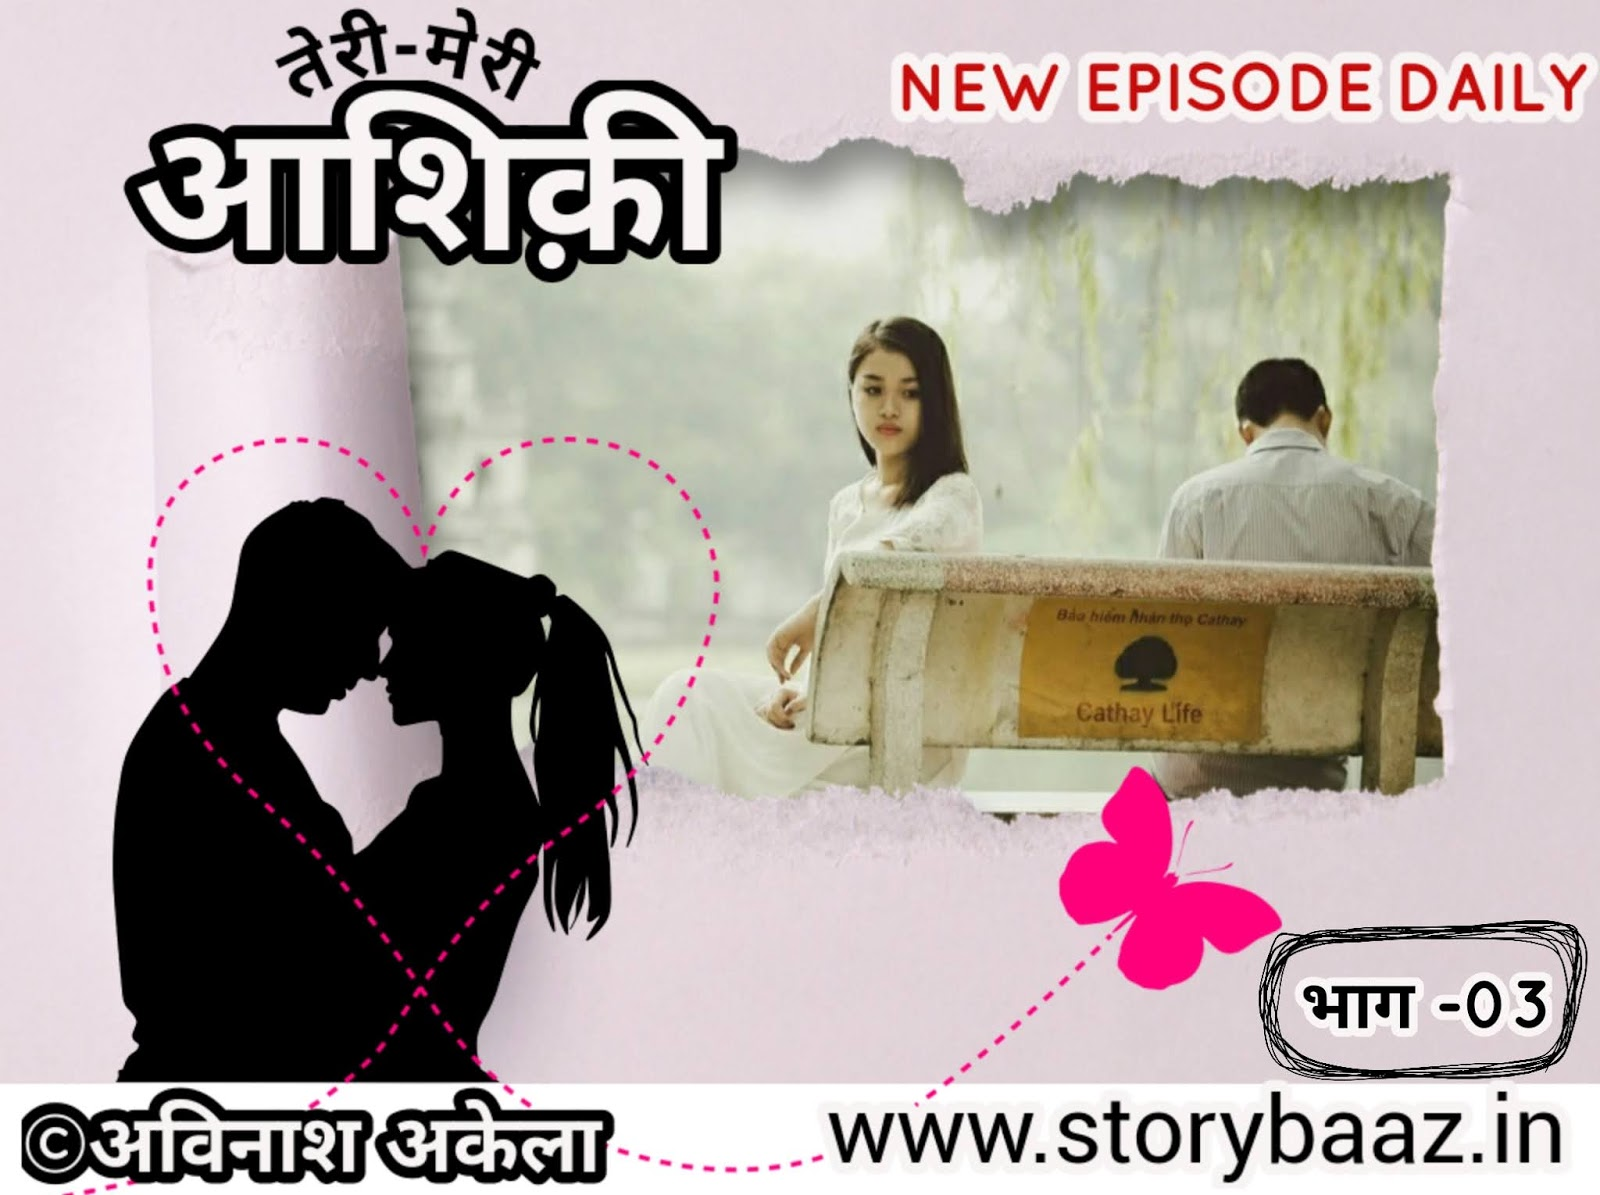 teri-meri-aashiqui-part-3-school-love-story-in-hindi-hindi-stories-feeling-love-love-triangle-story